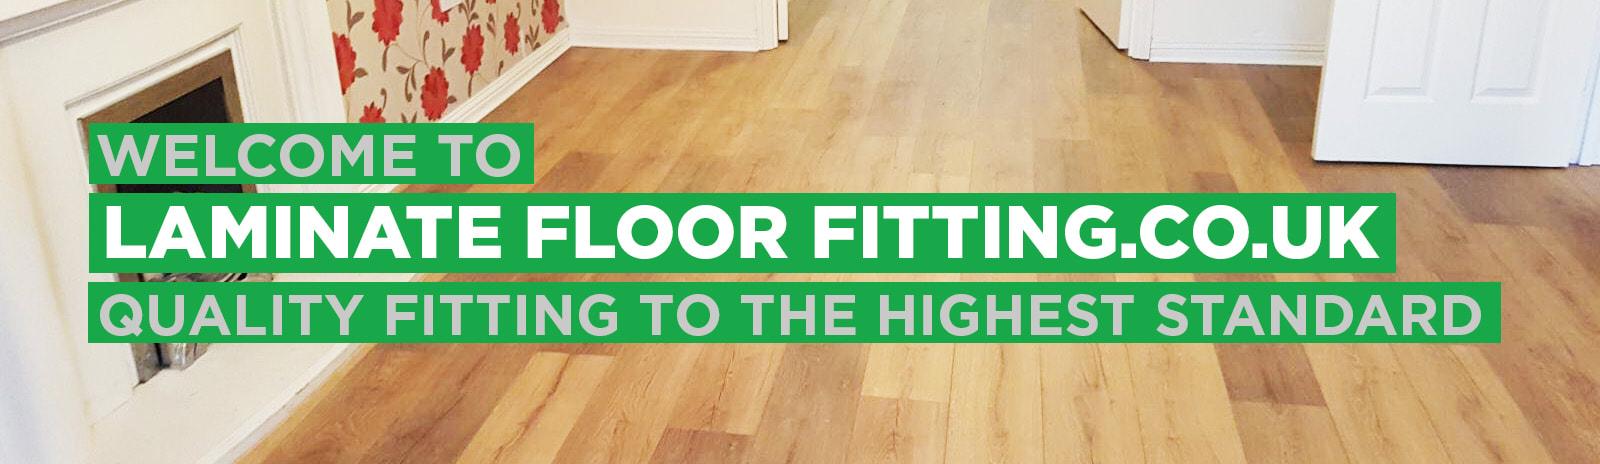 green laminate flooring uk laminate flooring ideas. Black Bedroom Furniture Sets. Home Design Ideas